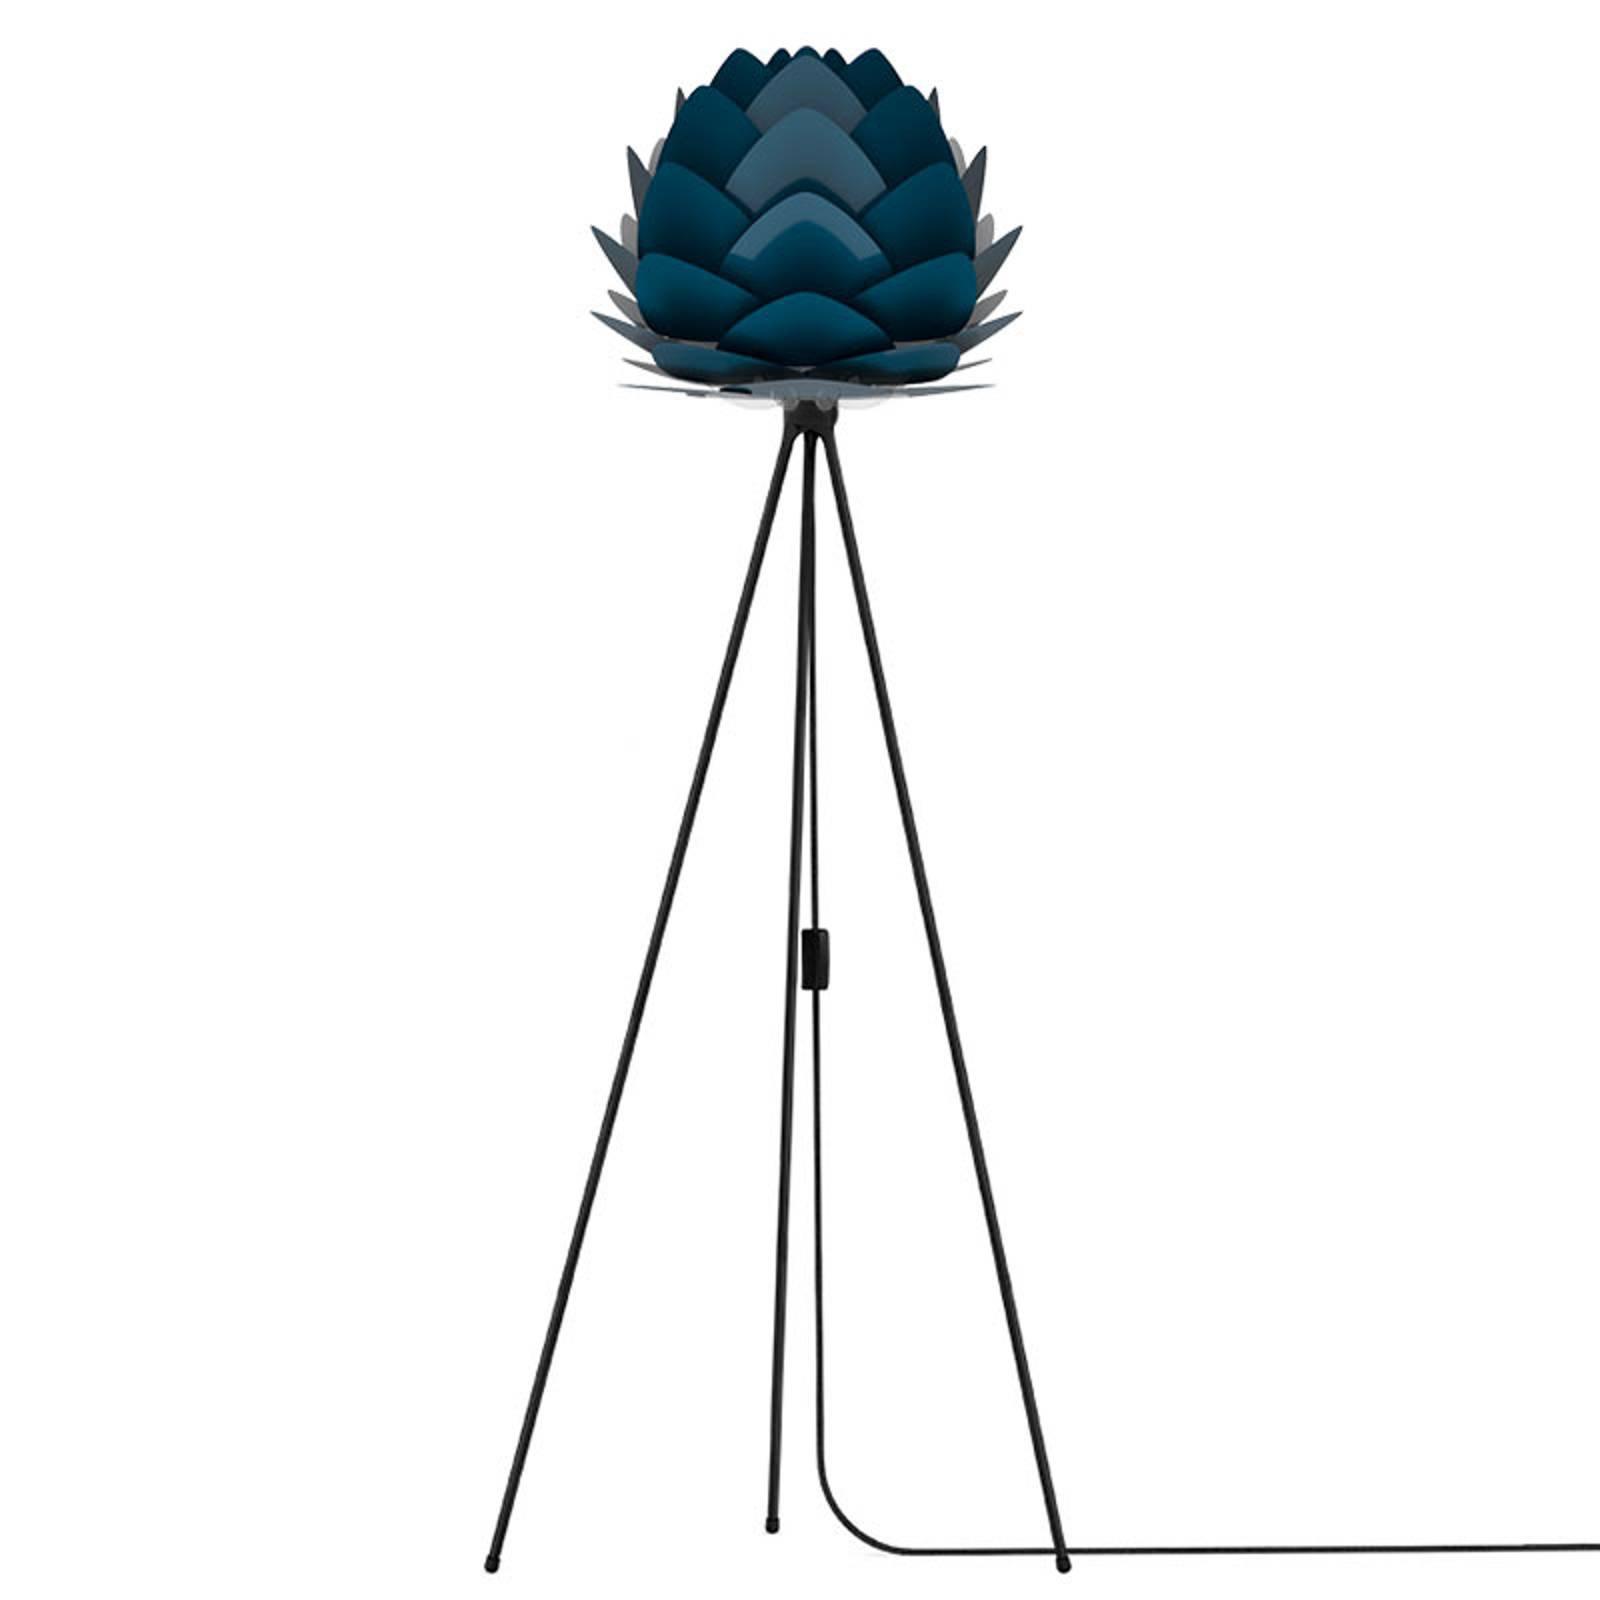 UMAGE Aluvia mini-gulvlampe svart/blå